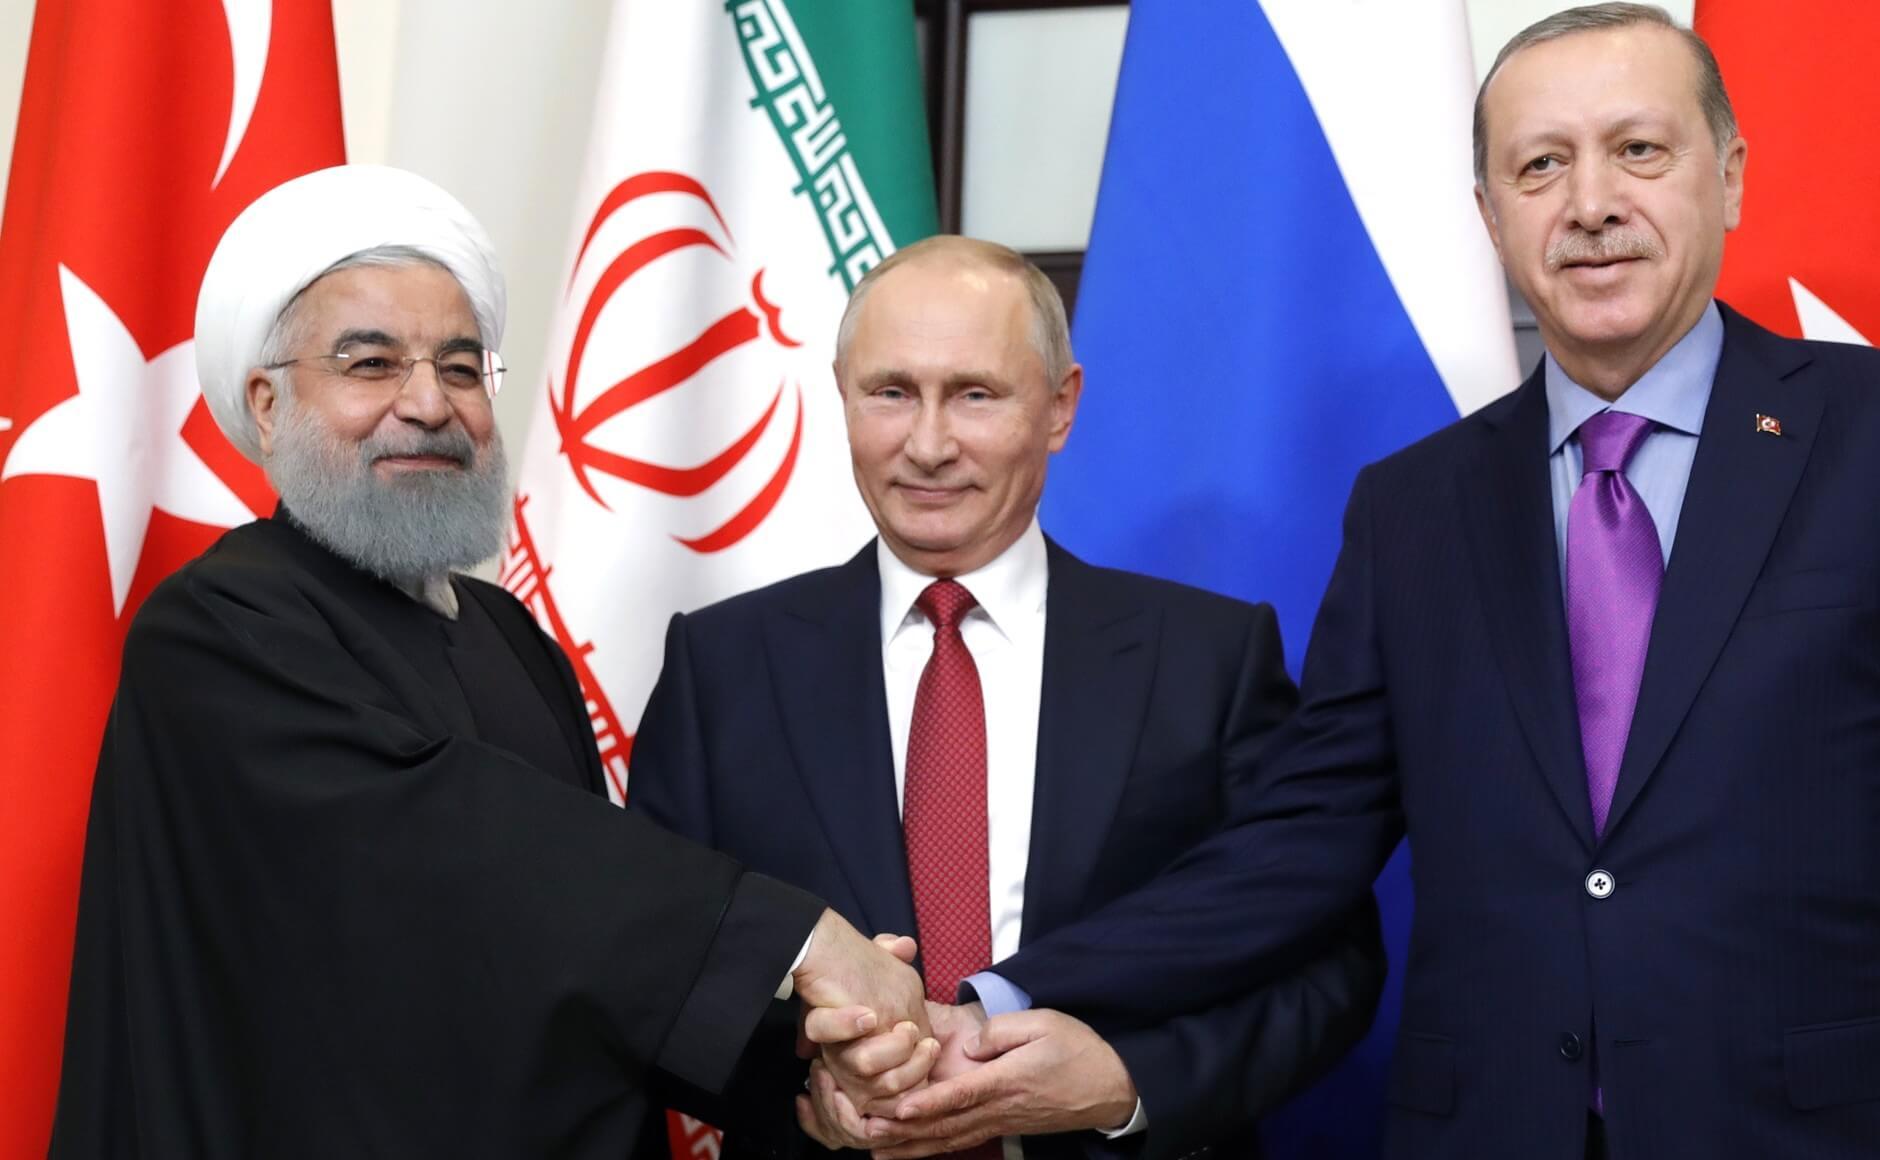 Vladimir Putin, Hassan Rouhani, and Recep Tayyip Erdoğan in Russia, 2017